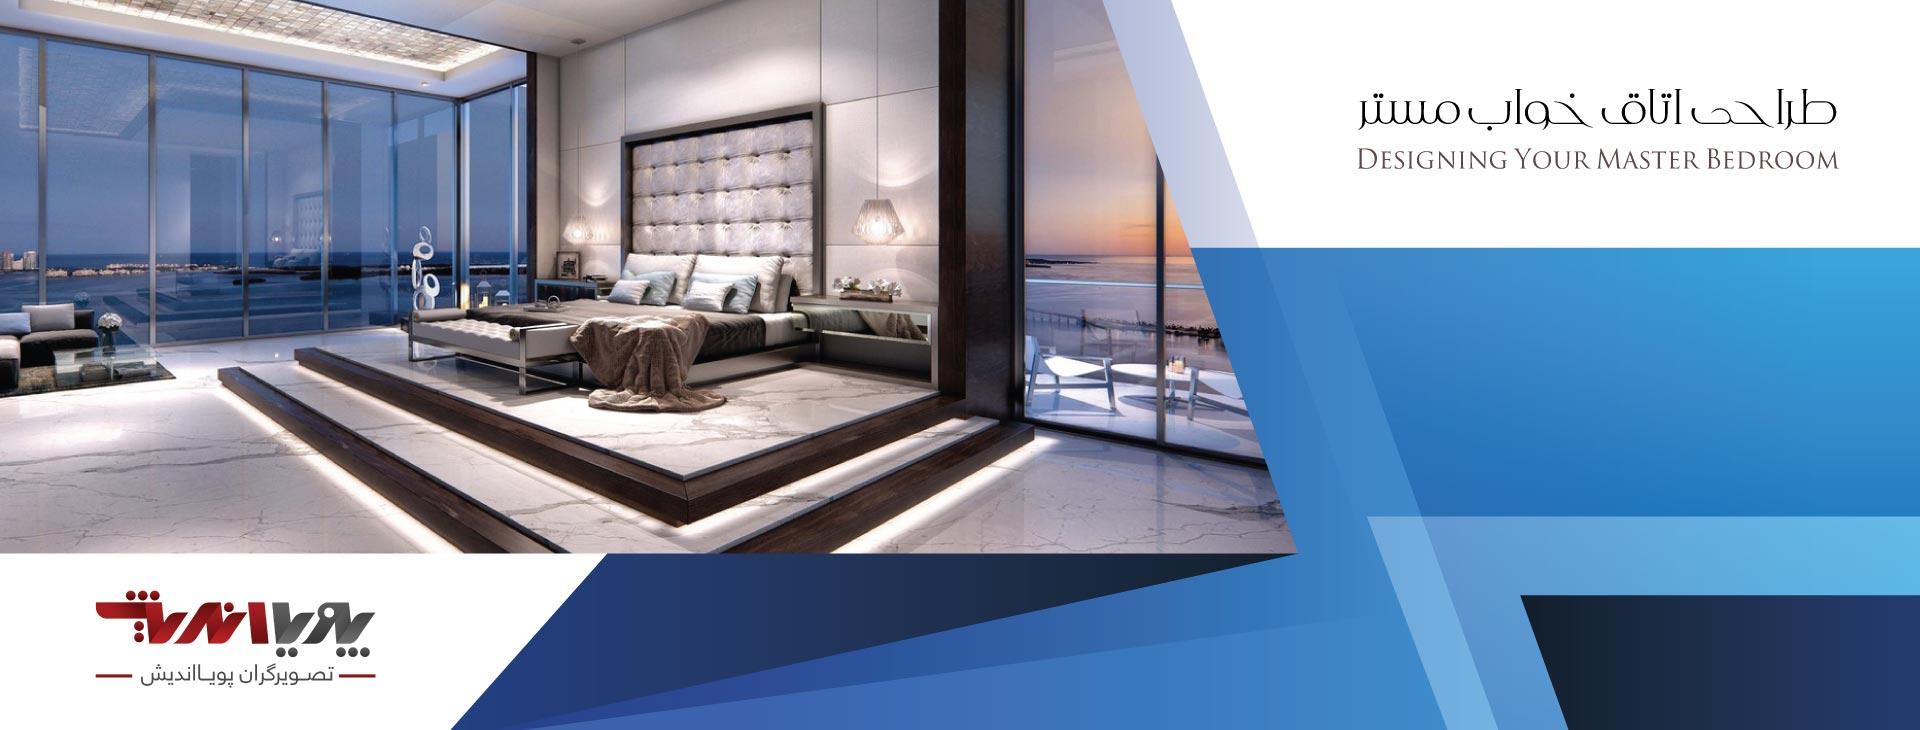 master room decor - طراحی اتاق خواب مستر